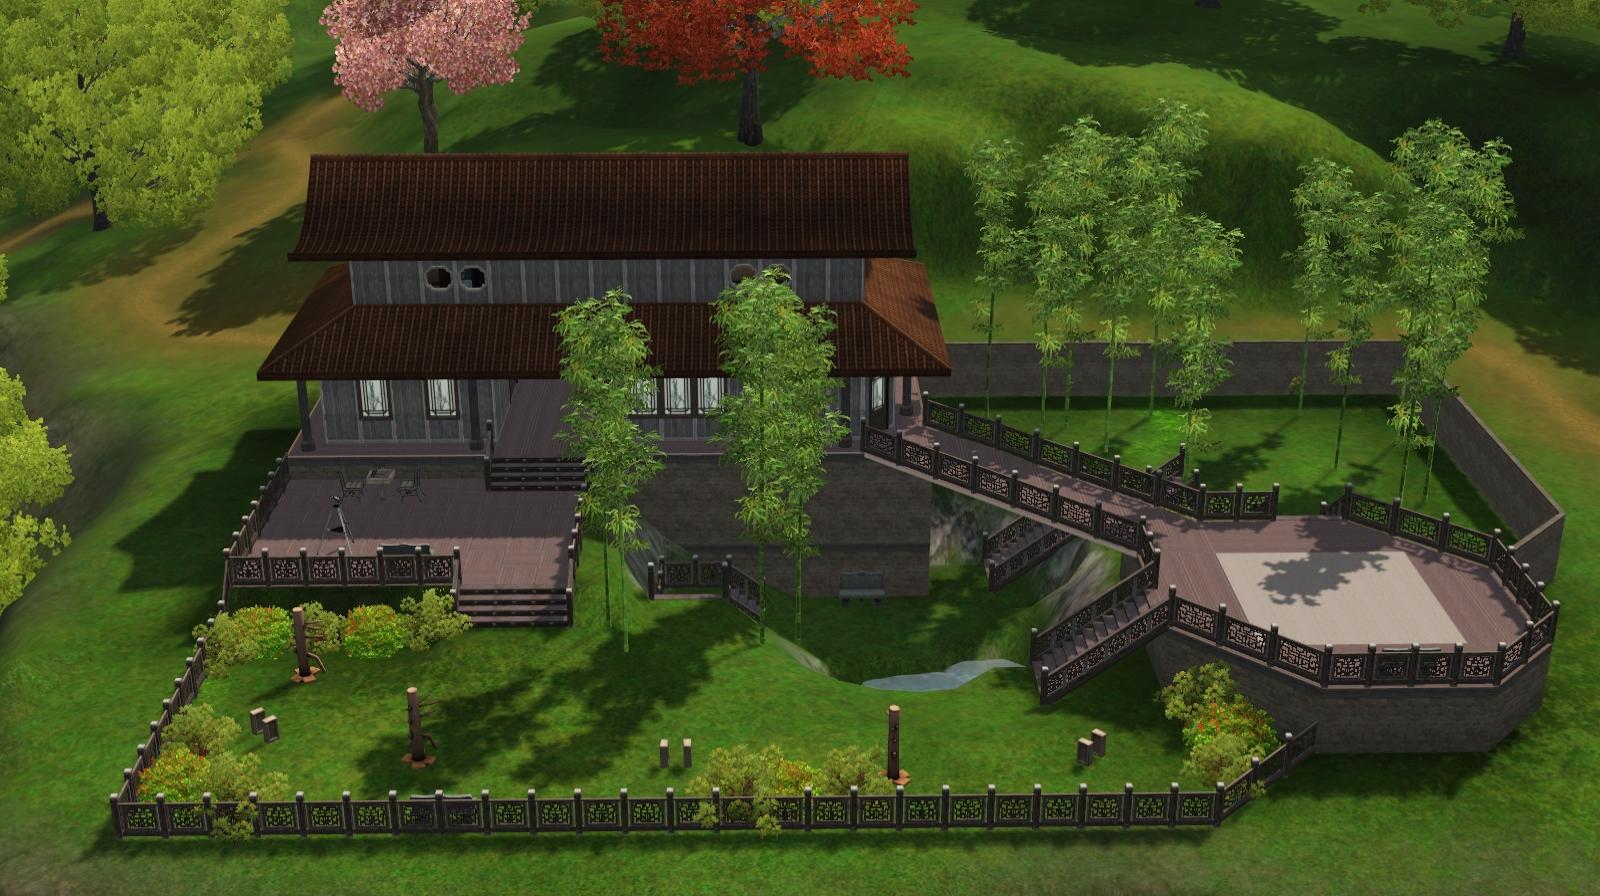 sims 3 community lots compendium sims 3 miscellaneous. Black Bedroom Furniture Sets. Home Design Ideas